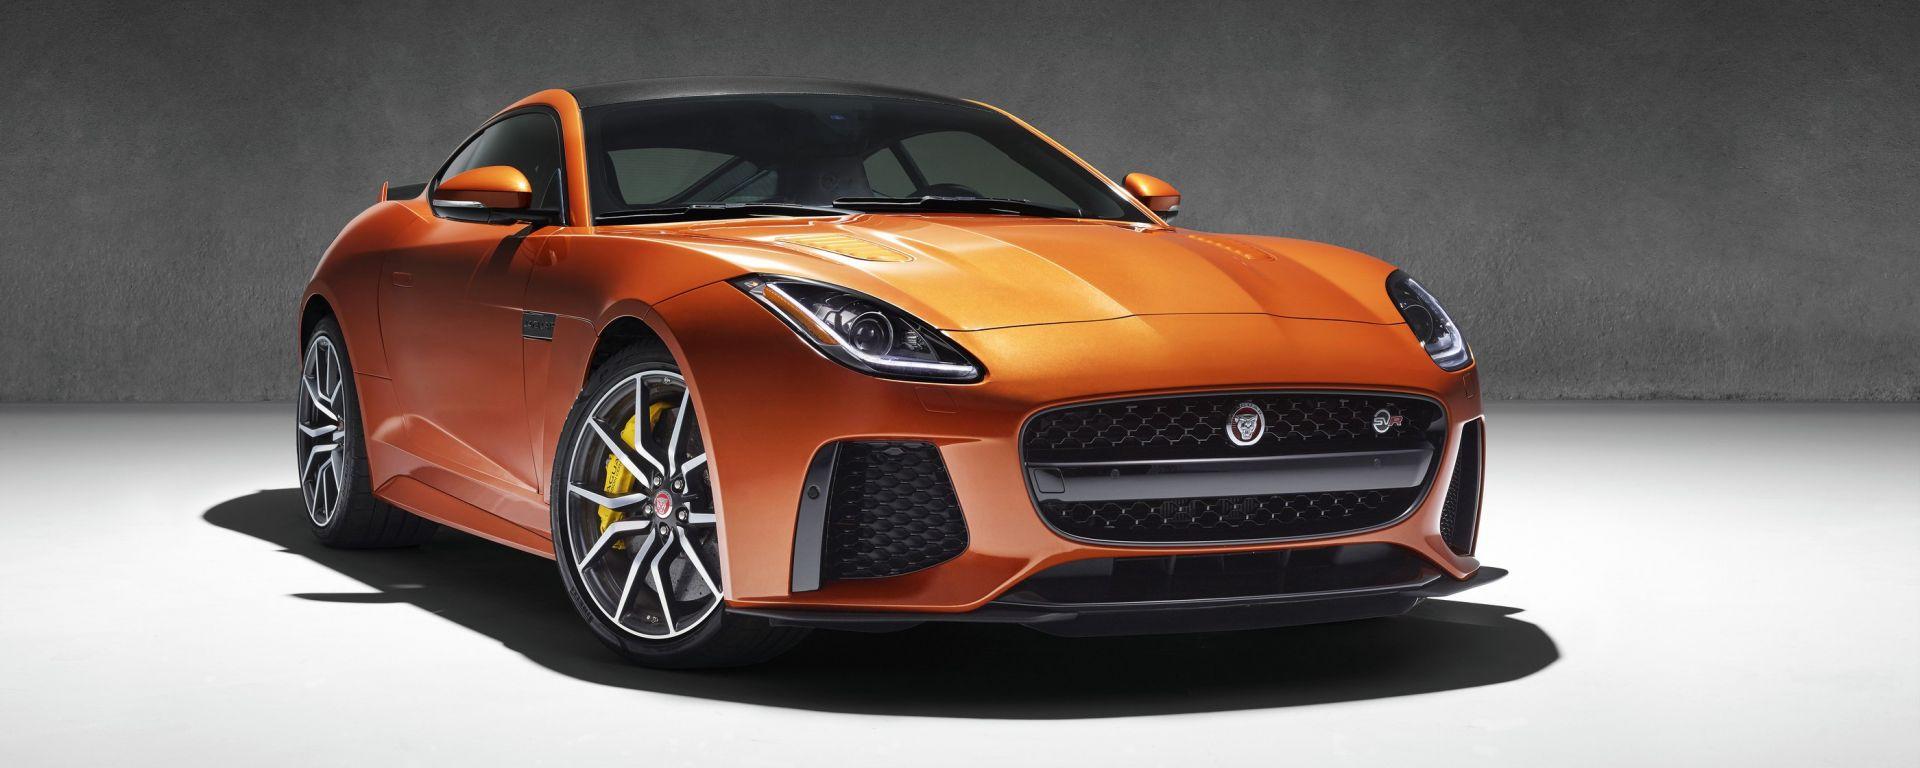 Ginevra 2016 - Notizie dalle Case: Jaguar